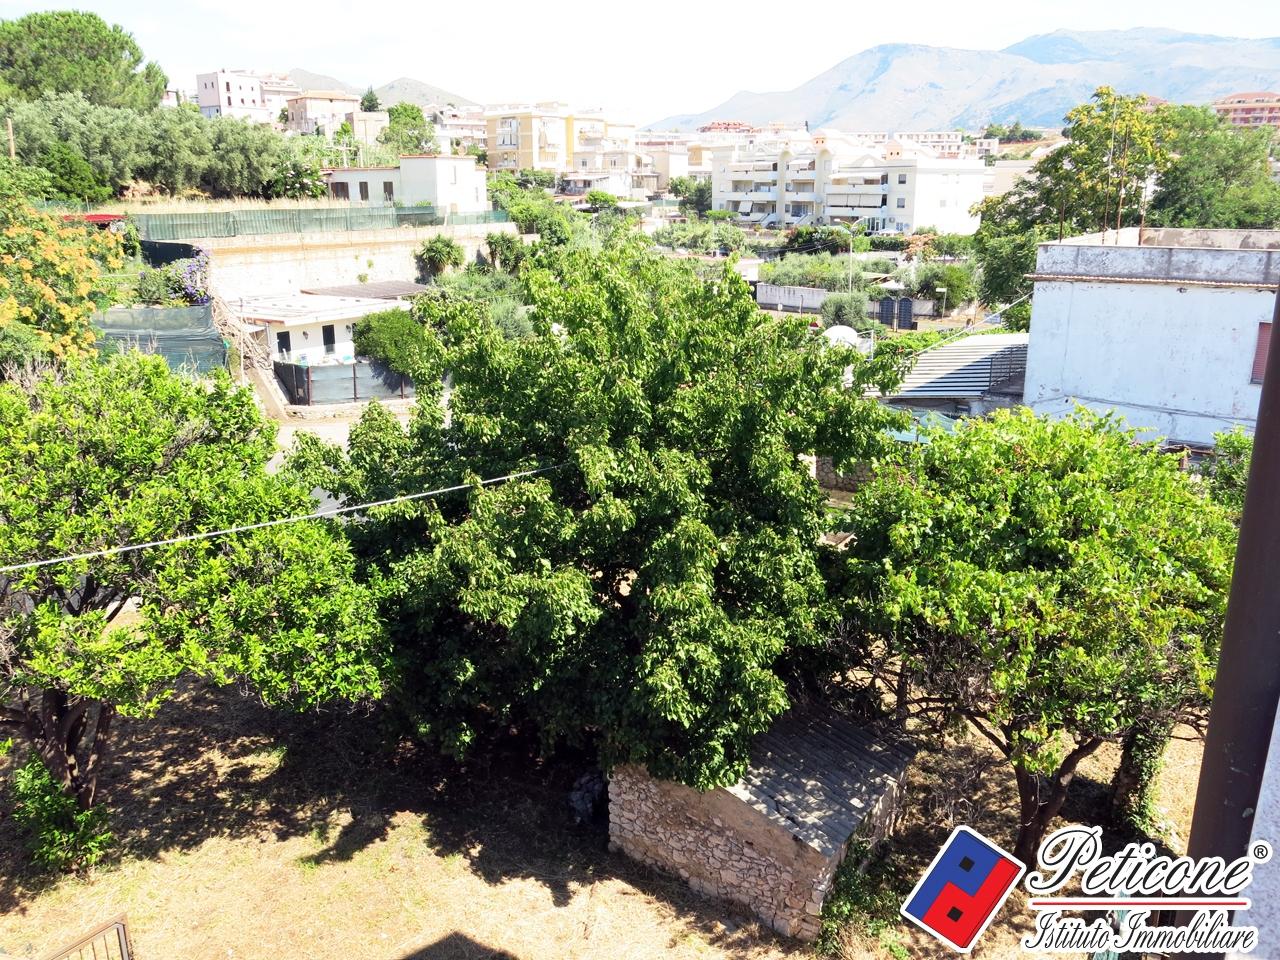 Villa in Vendita a Gaeta: 5 locali, 250 mq - Foto 19